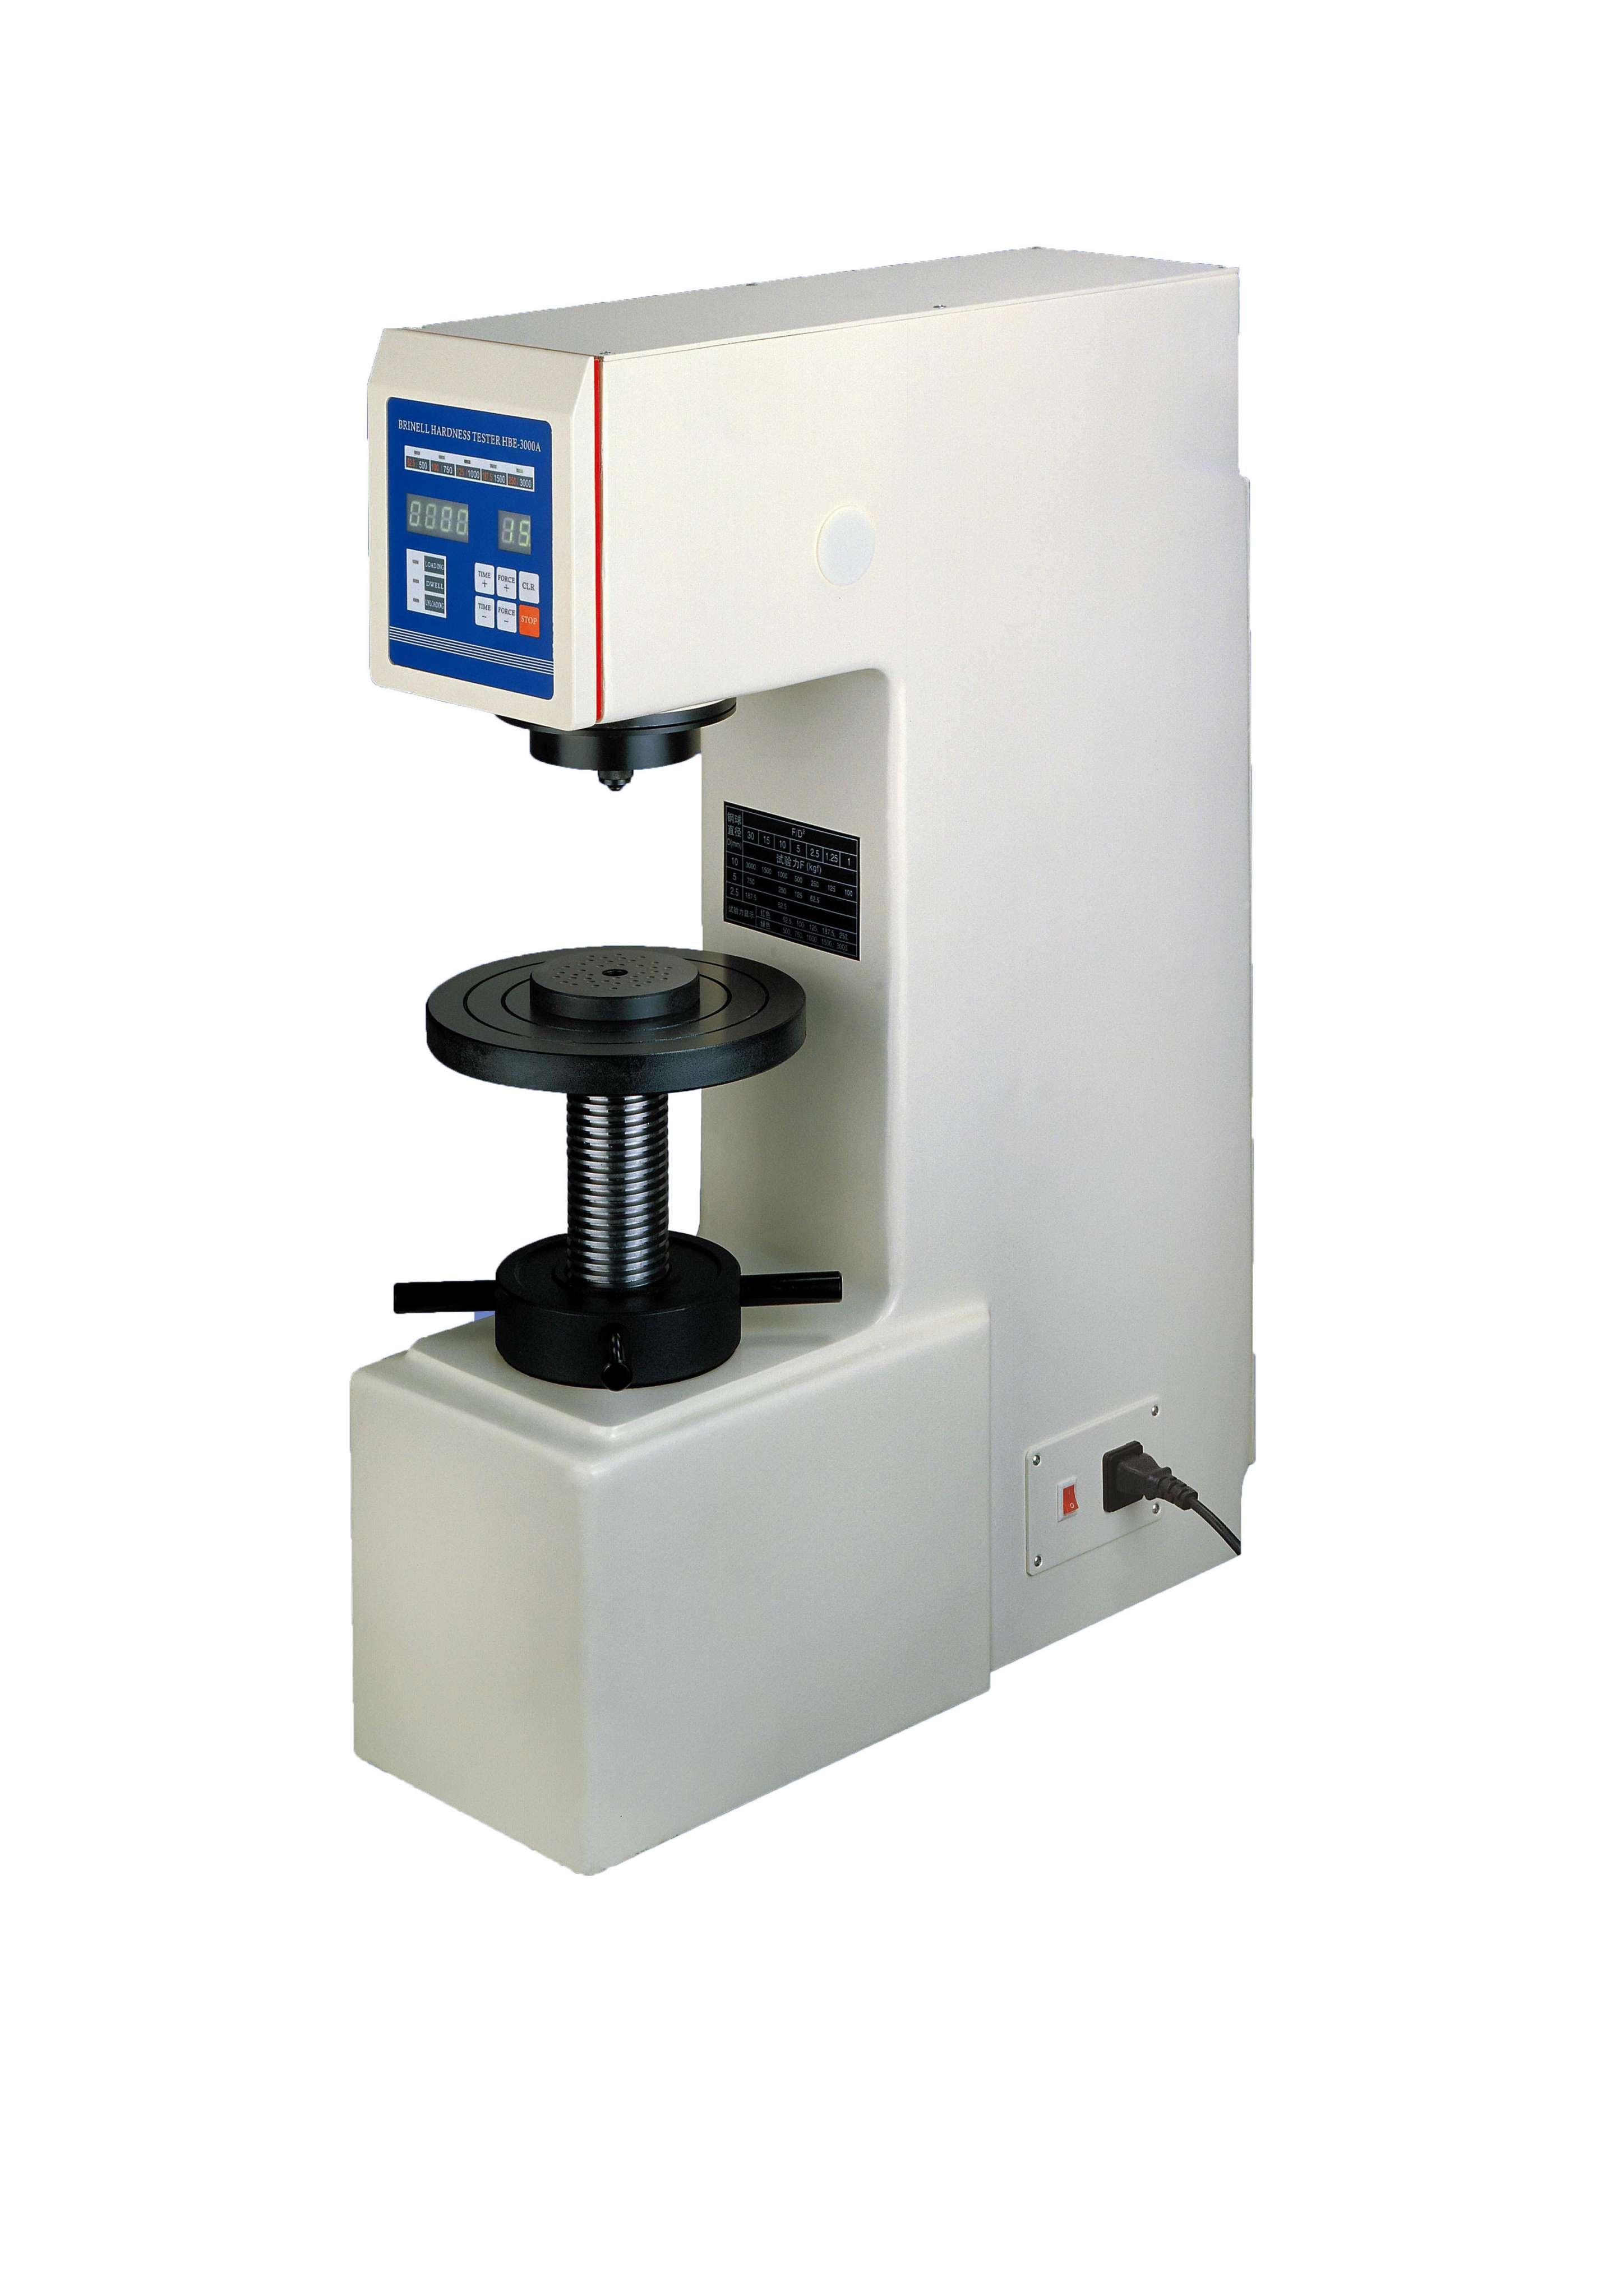 HB-3000E 电子布氏硬度计